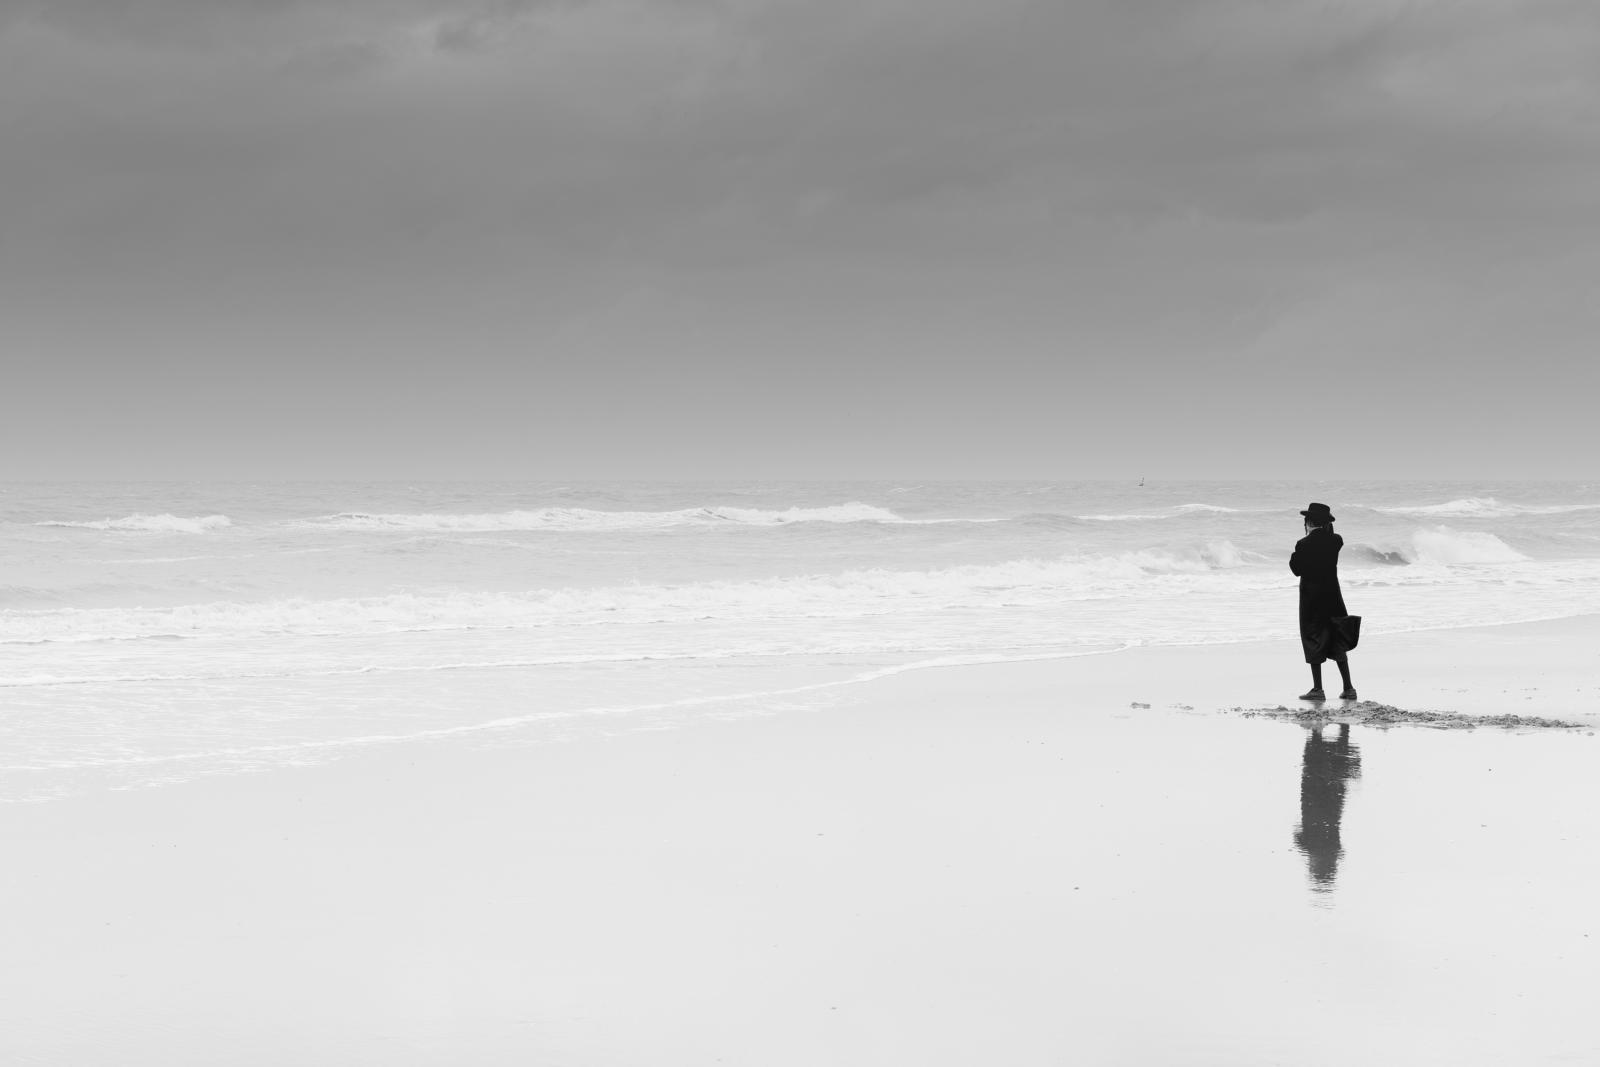 Photography image - Loading 01.Eddy_Verloes_The_sea_watcher.jpg